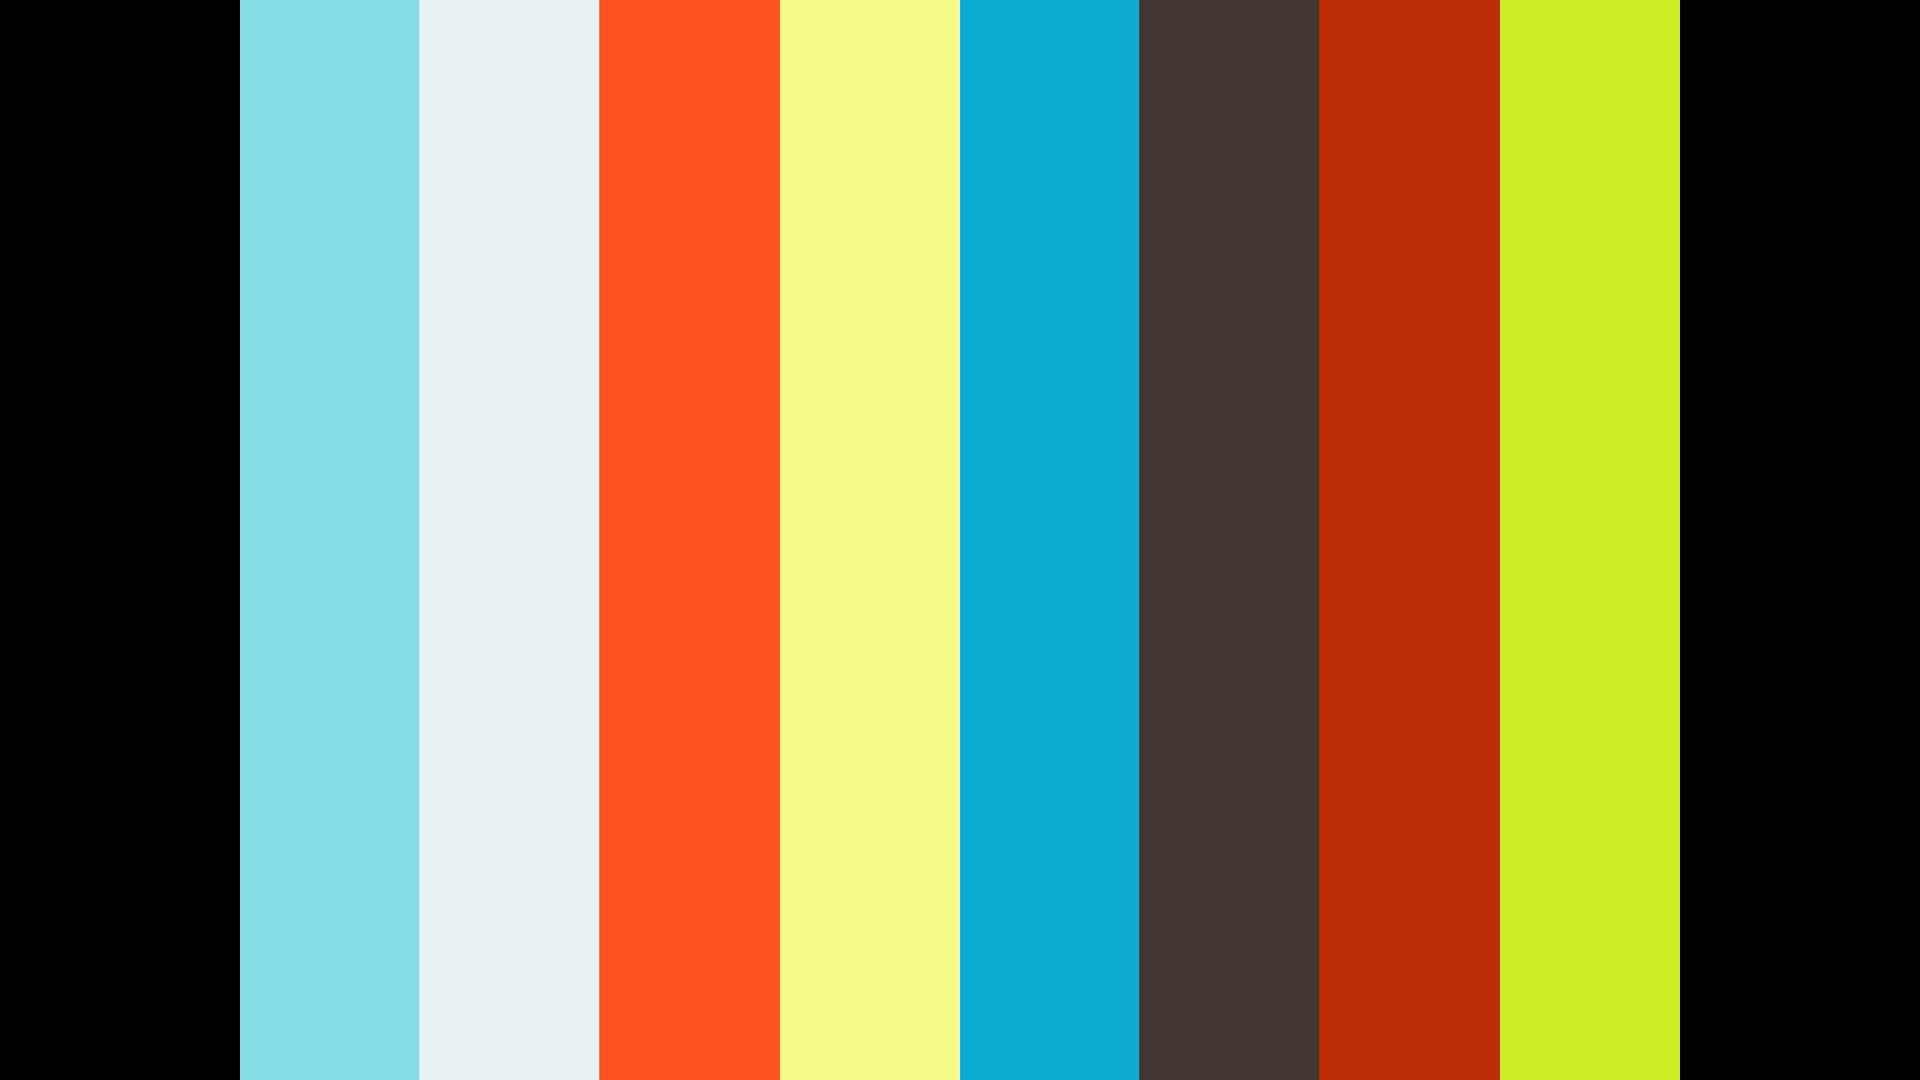 Himmel über Prohlis: Trailer | Kurzdoku